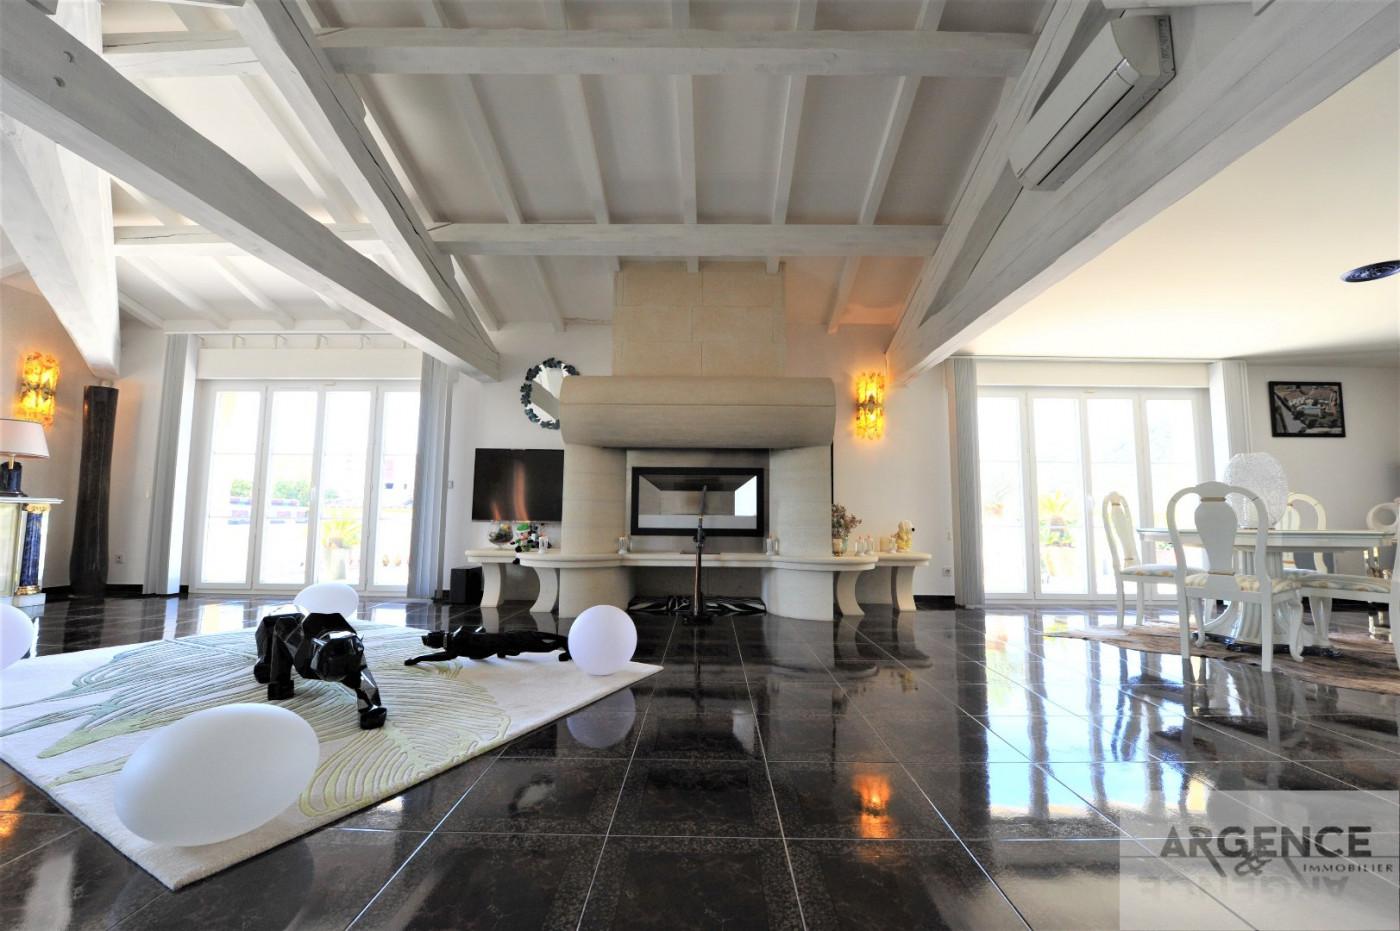 A vendre  Montpellier | Réf 345335740 - Argence immobilier